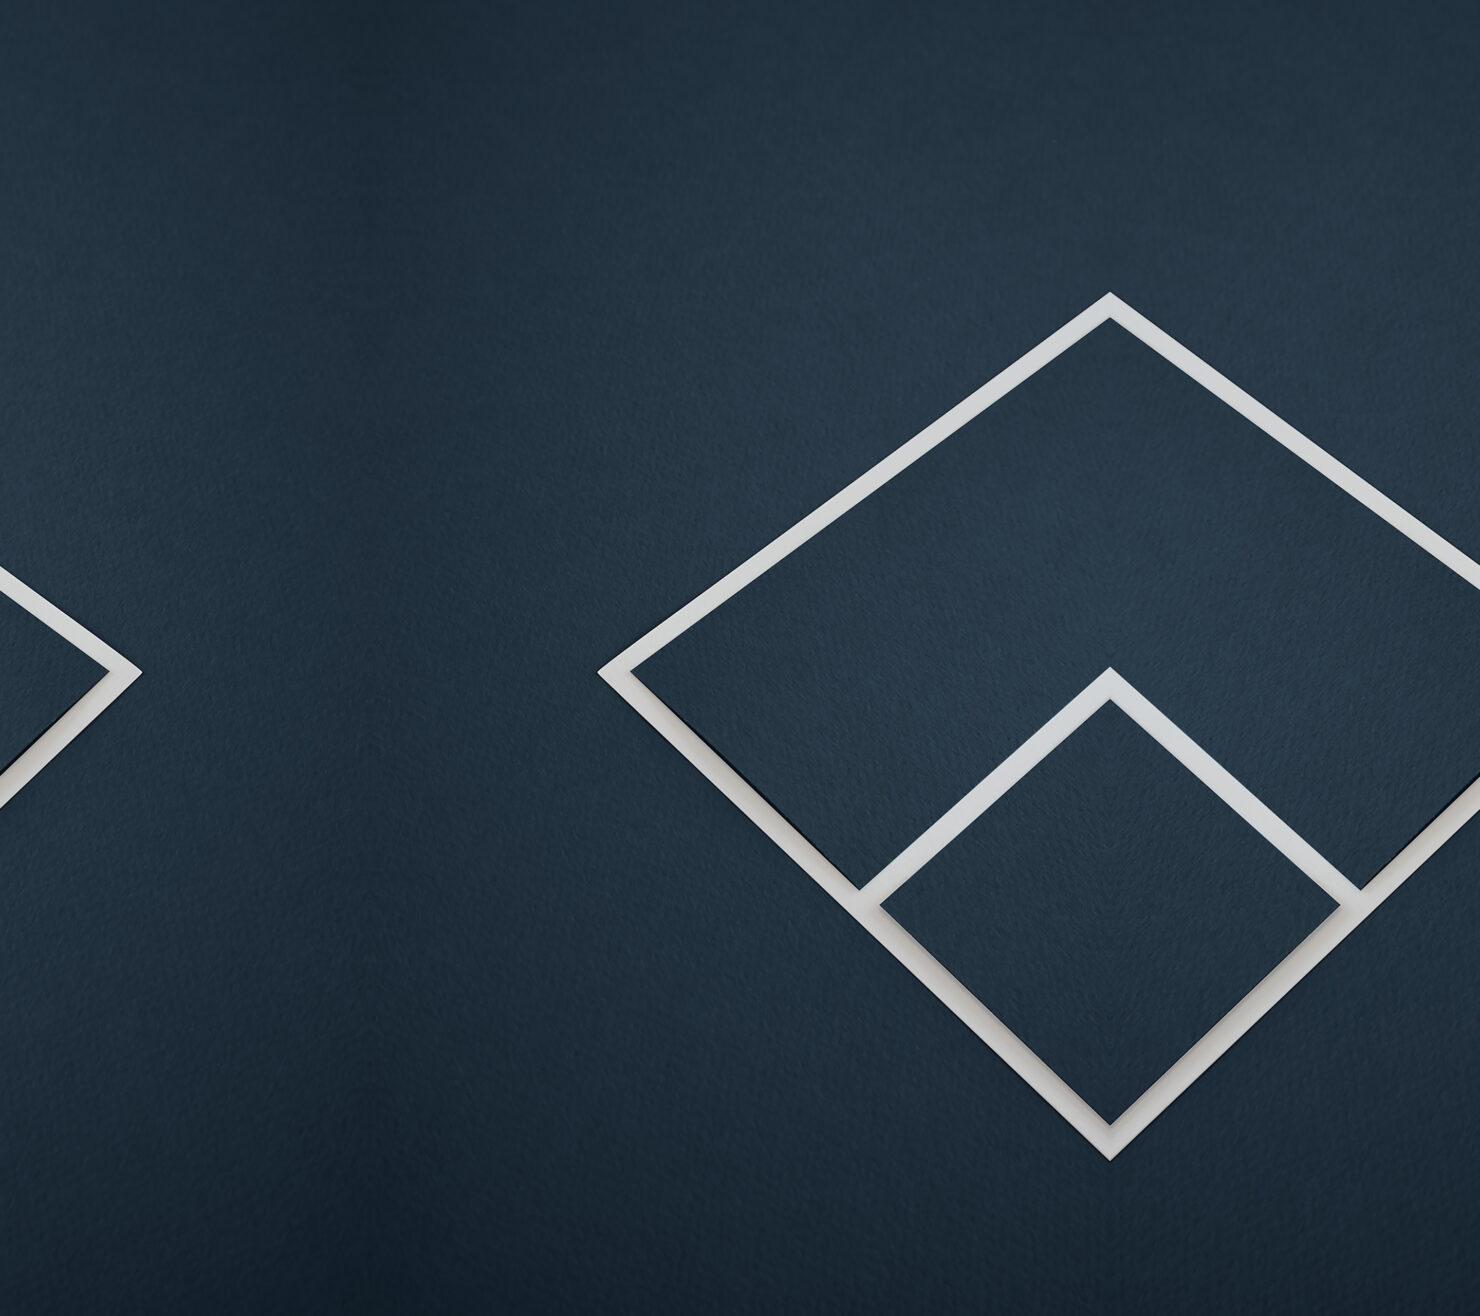 twelvth-htc-one-m9-wallpaper